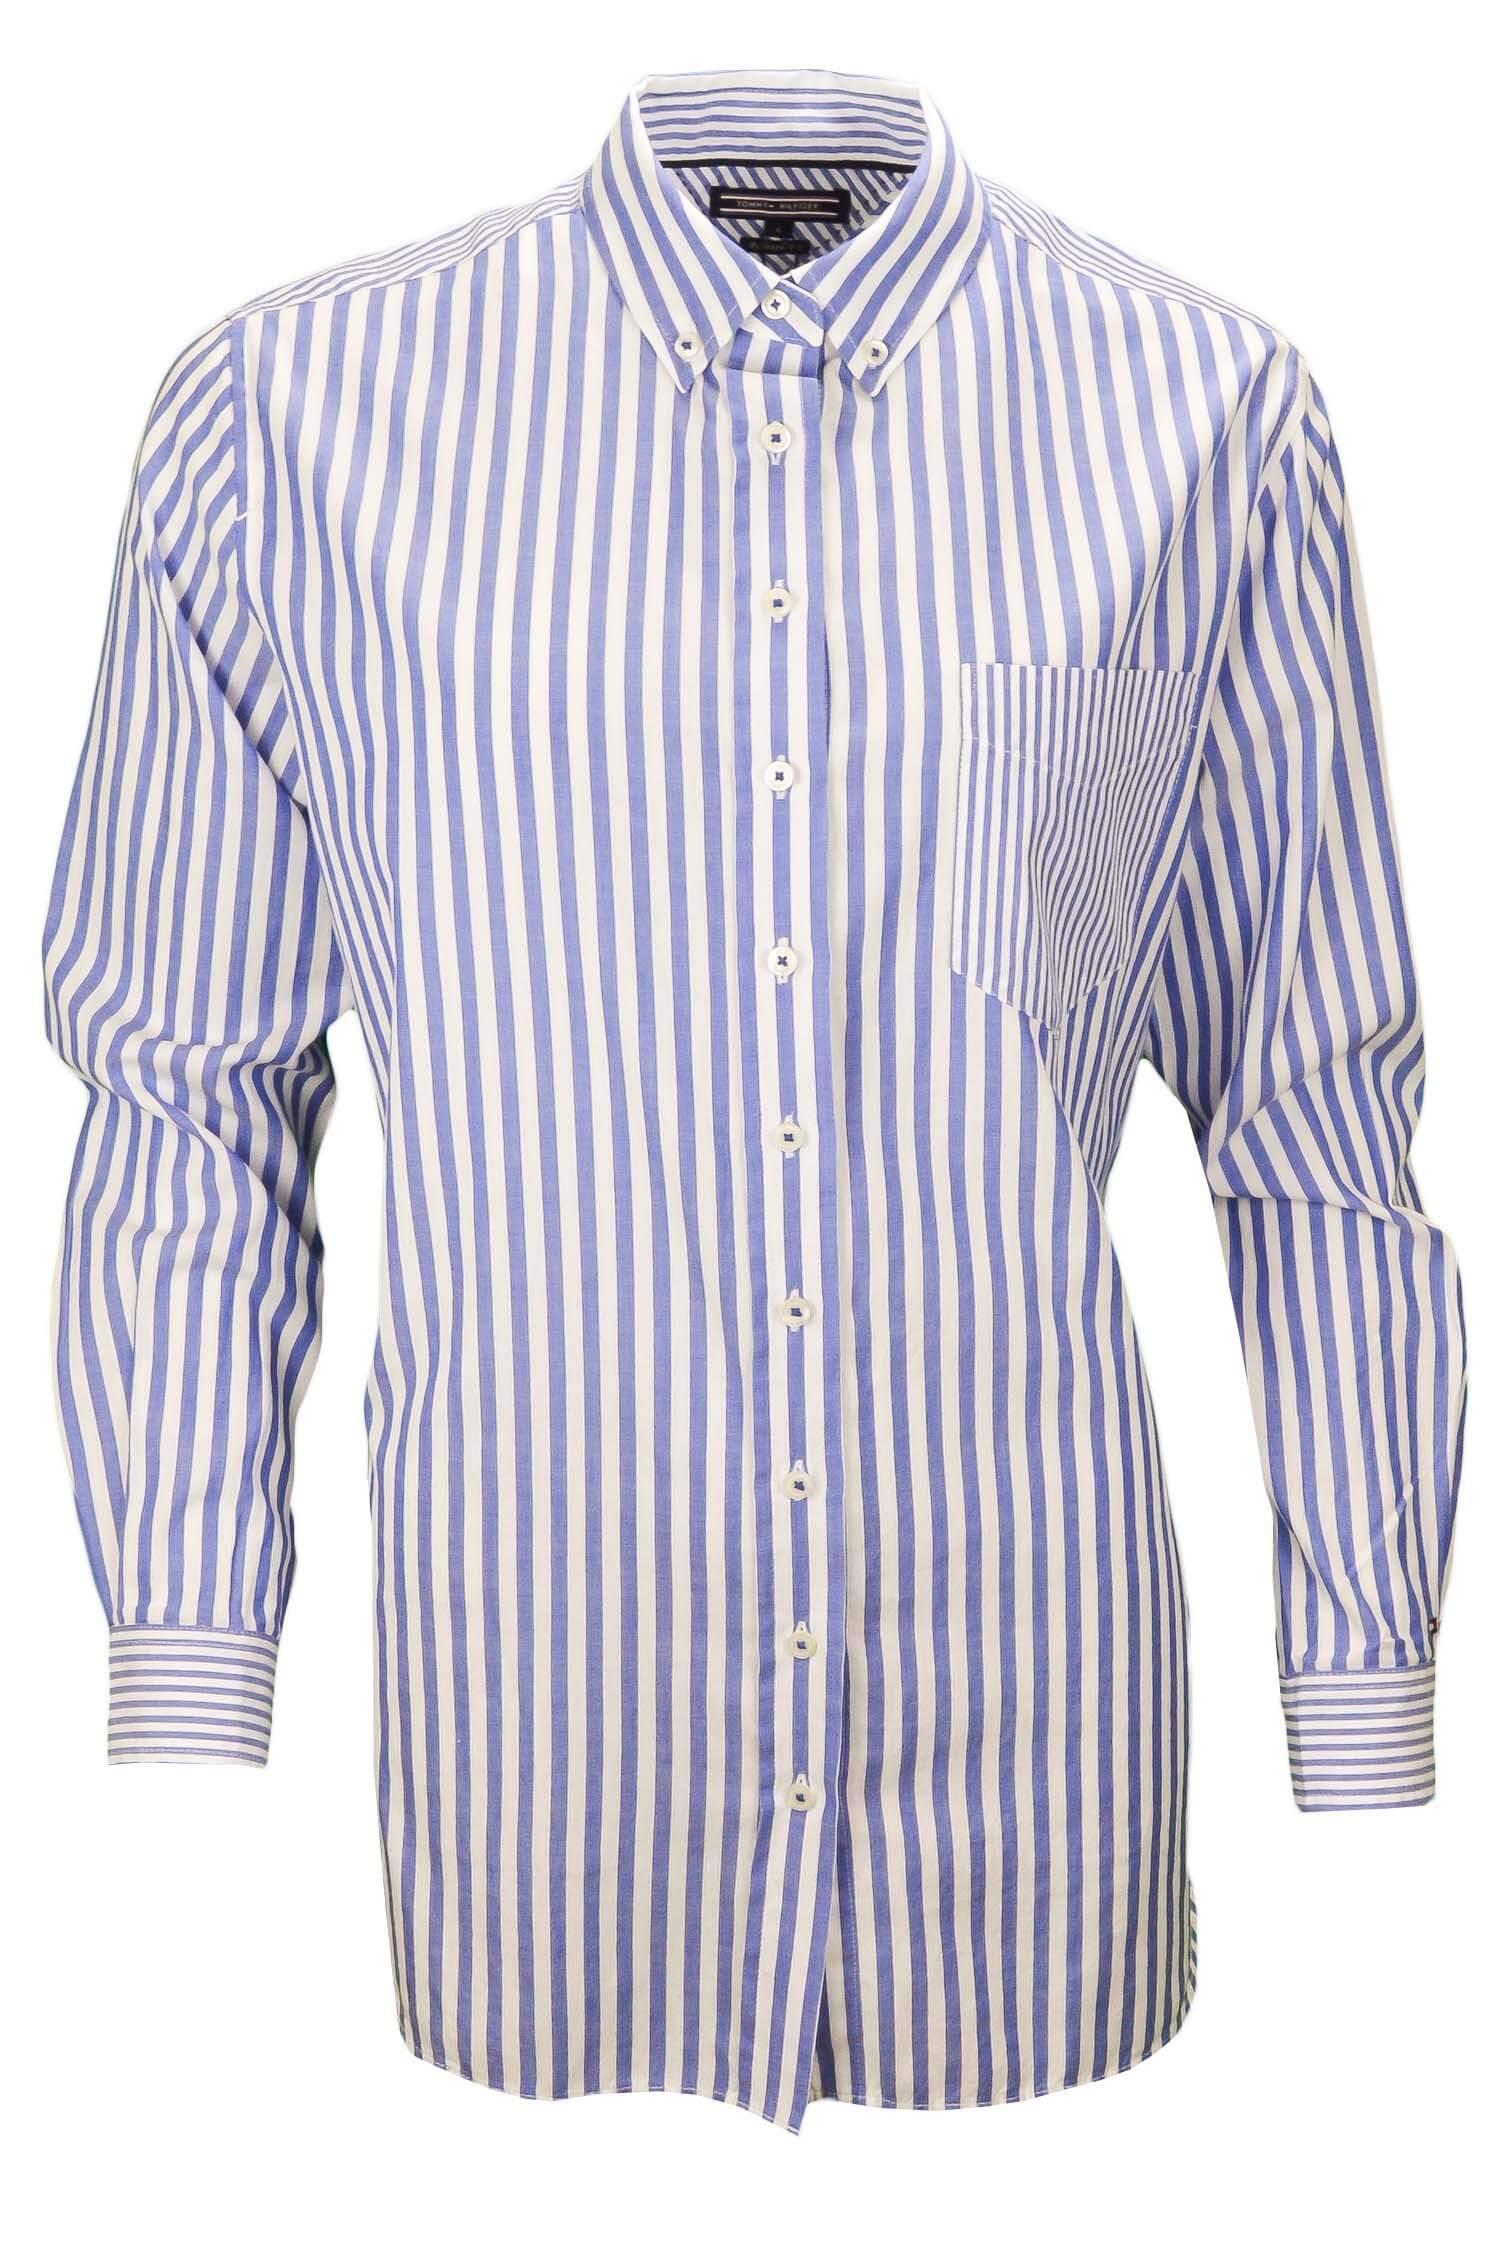 chemise blanc et bleu femme ori chemise homme a rayures bleu marine interieur blanc poignets napolit. Black Bedroom Furniture Sets. Home Design Ideas